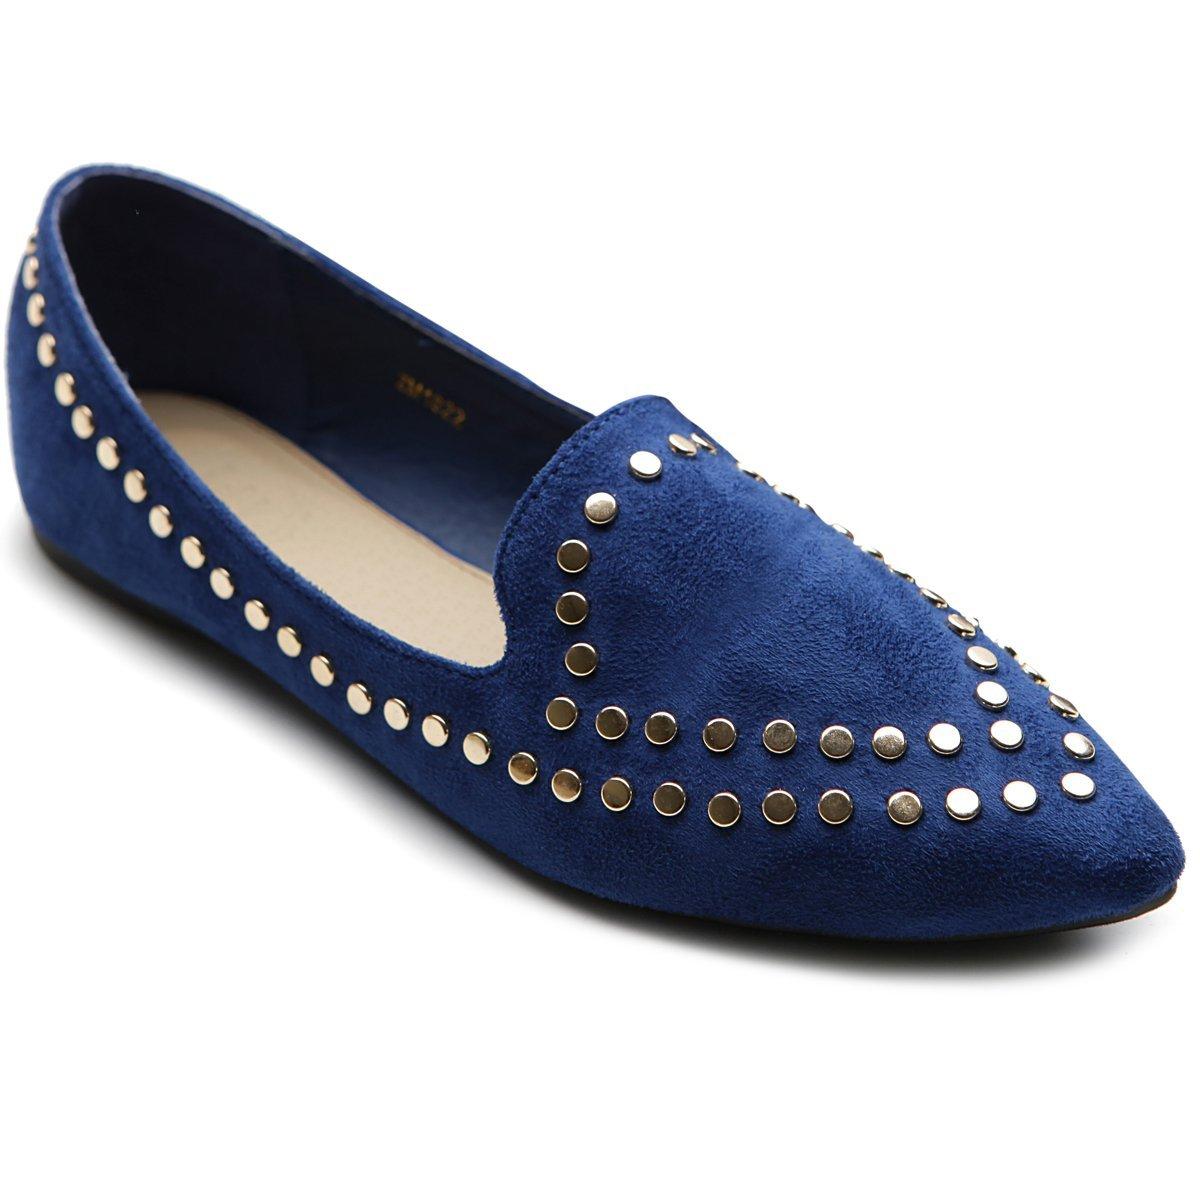 Ollio Women's Ballet Shoe Comfort Faux-Suede Studded Flat(5.5 B(M) US, Burgundy) B00HDOTFCA 6 B(M) US|Royal Blue